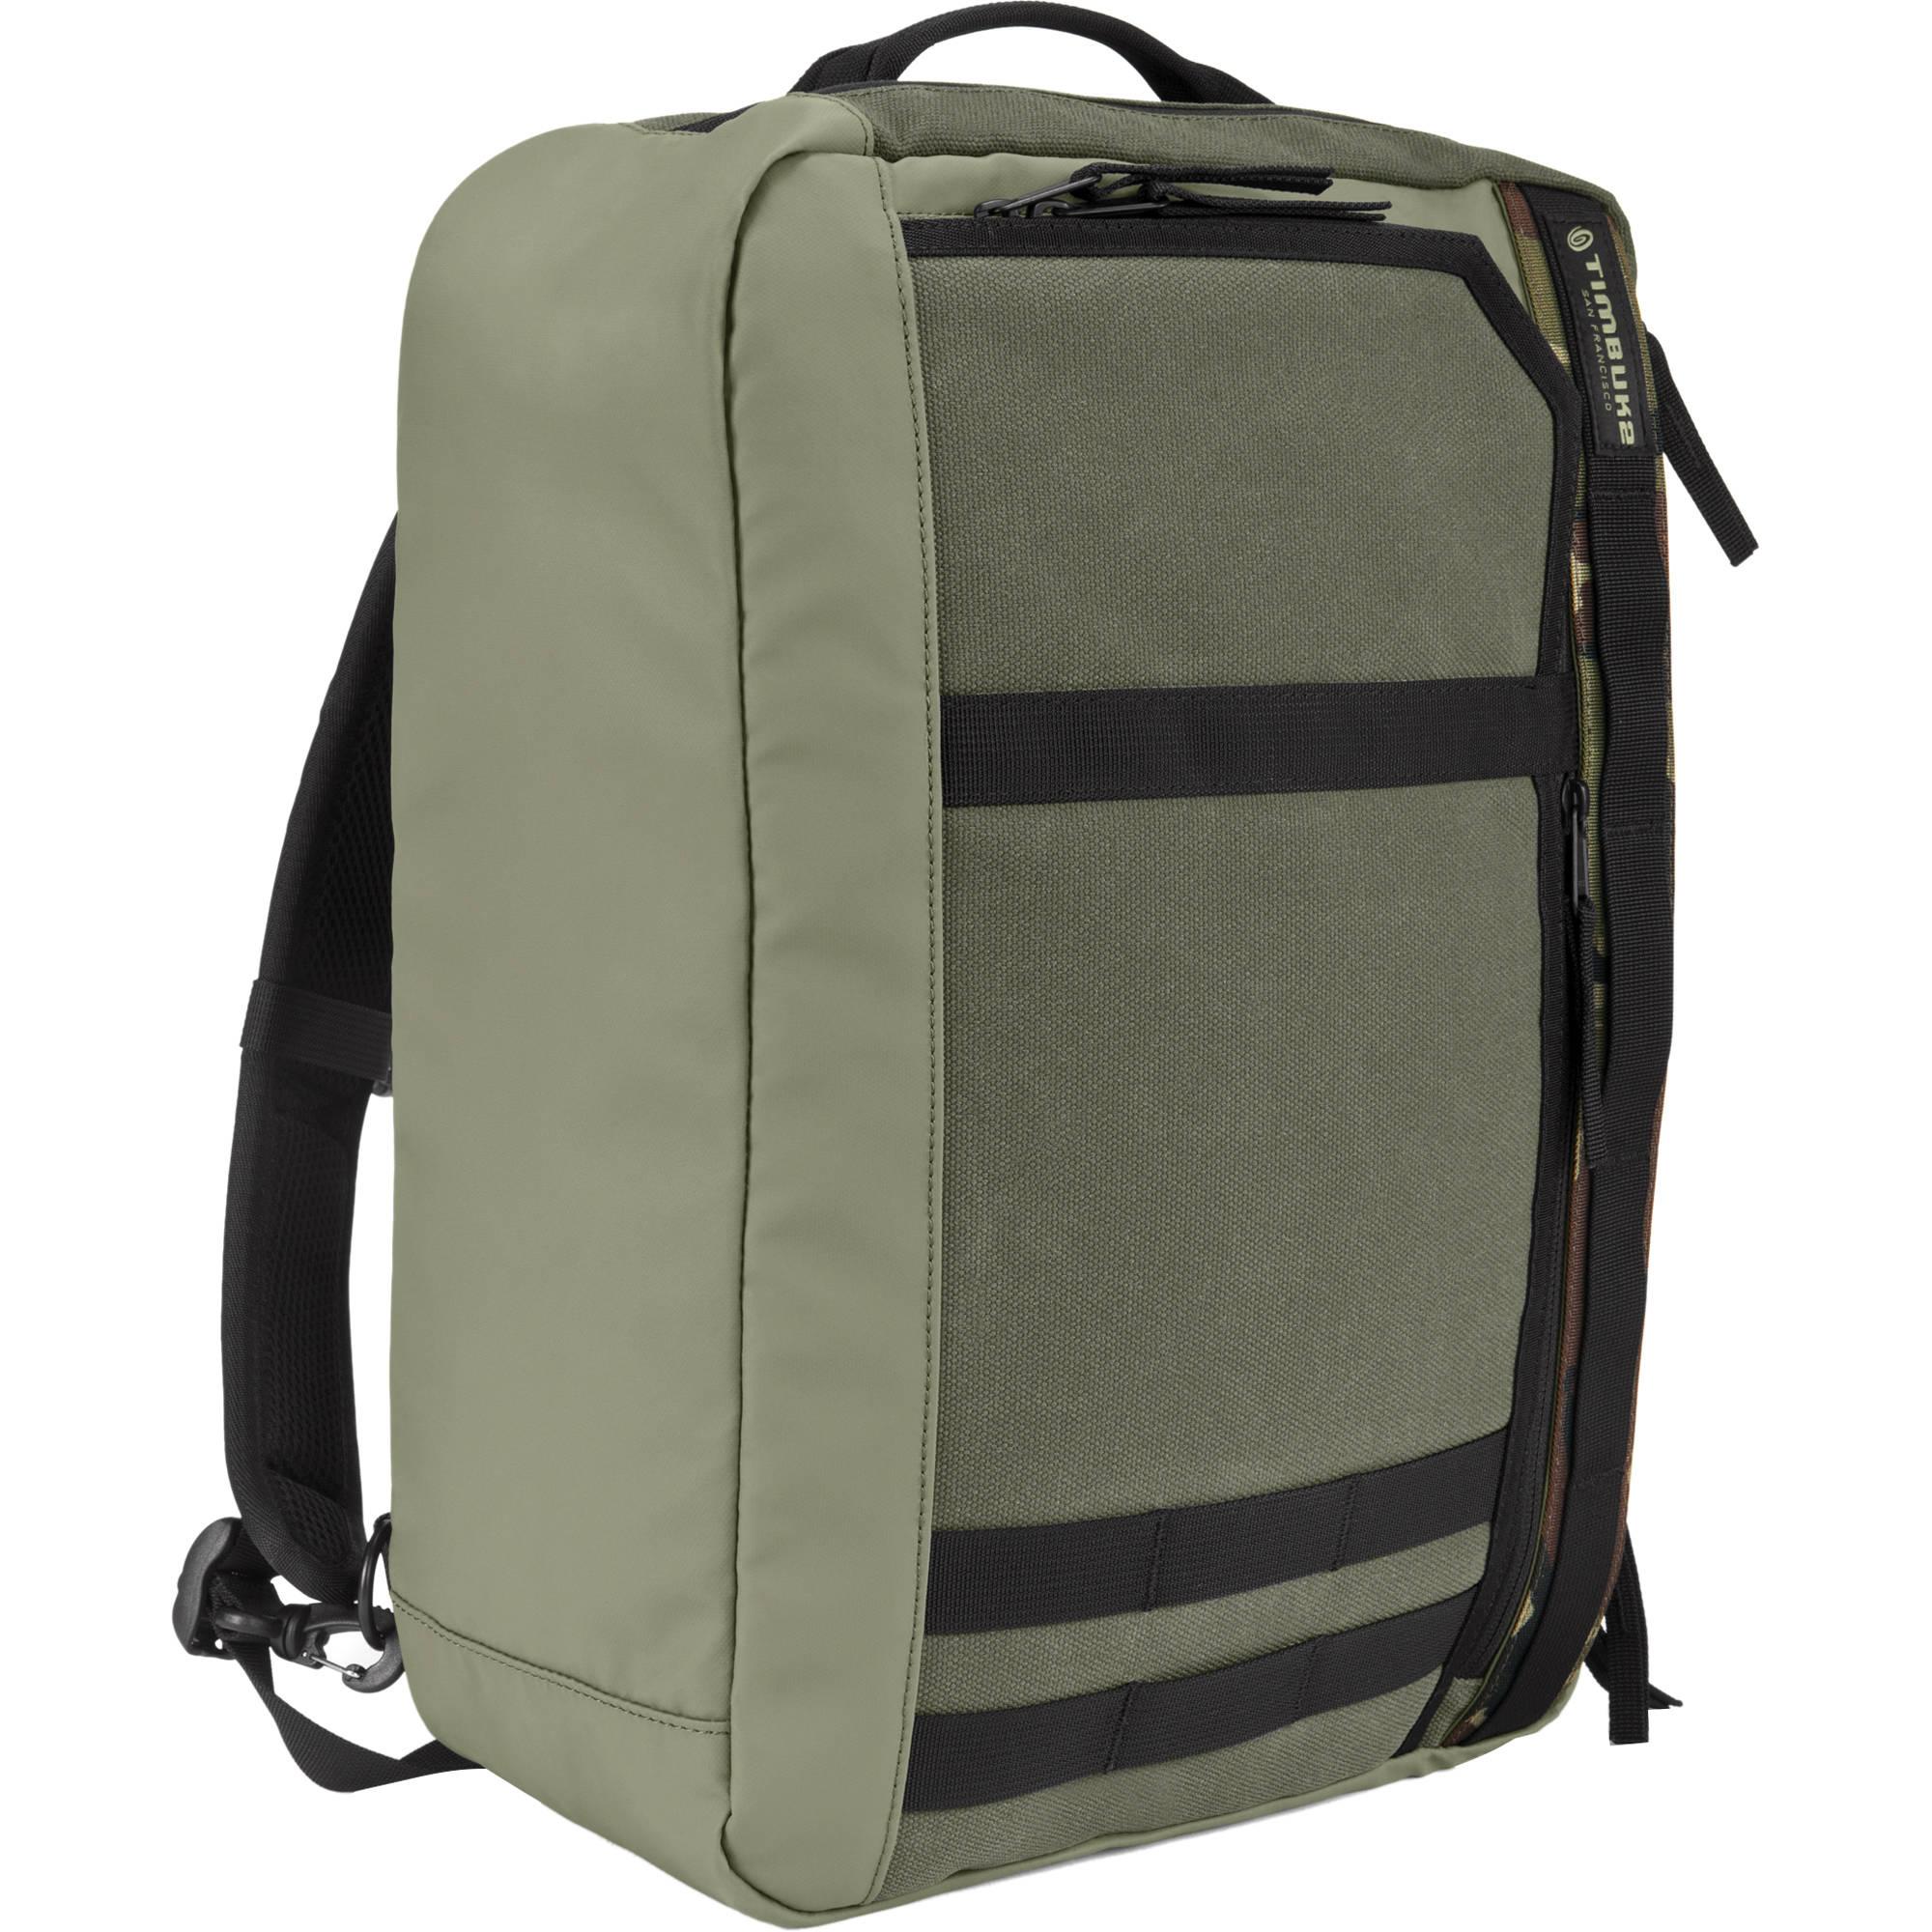 2601e324fa7 Timbuk2 Ace Laptop Backpack Messenger Bag (Fatigue) 354-4-5708